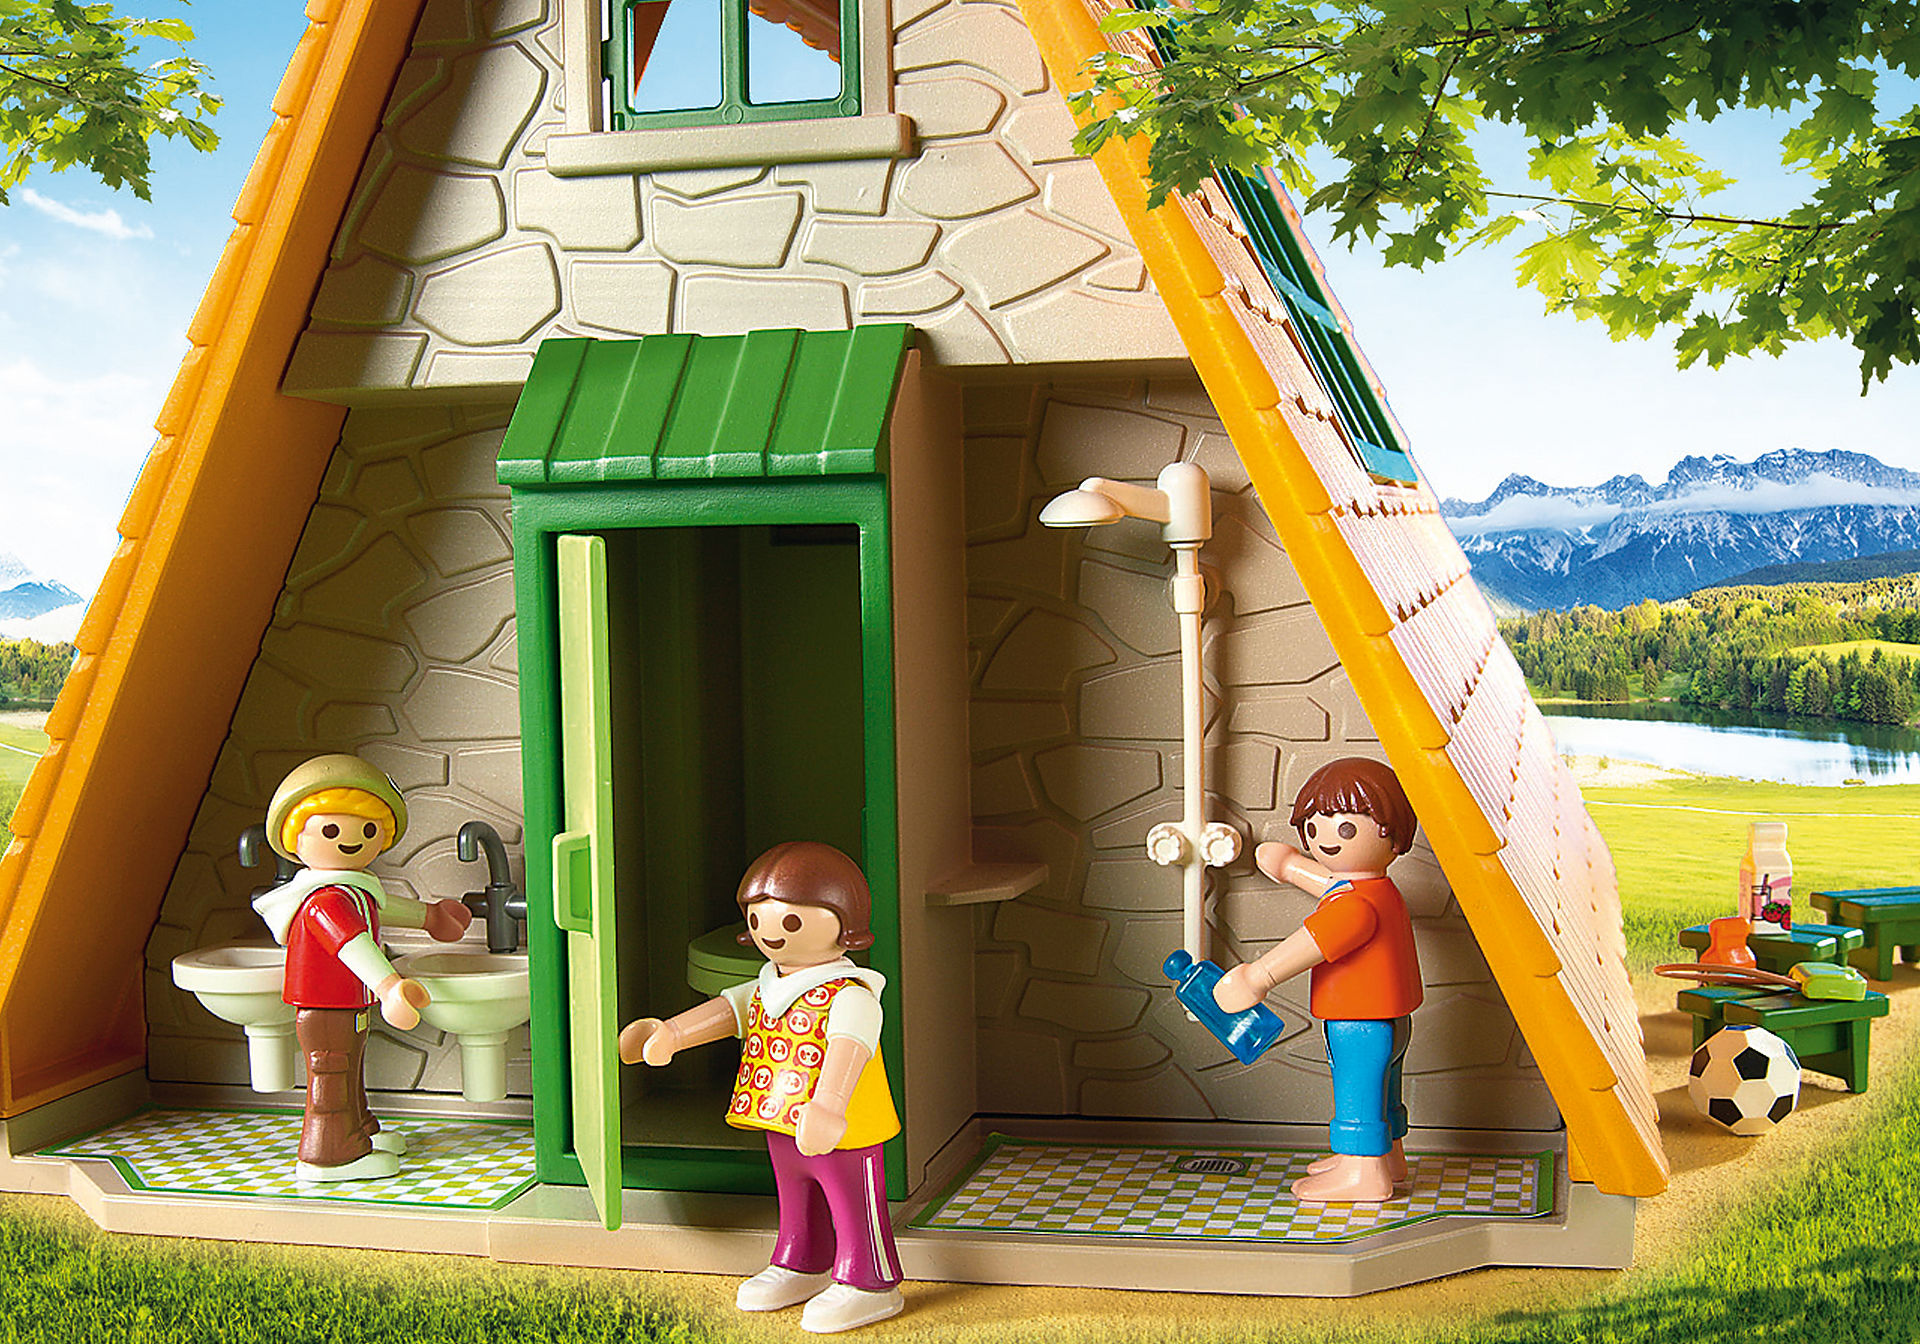 http://media.playmobil.com/i/playmobil/6887_product_extra3/Casa vacanze con area giochi e tavoli da pic-nic